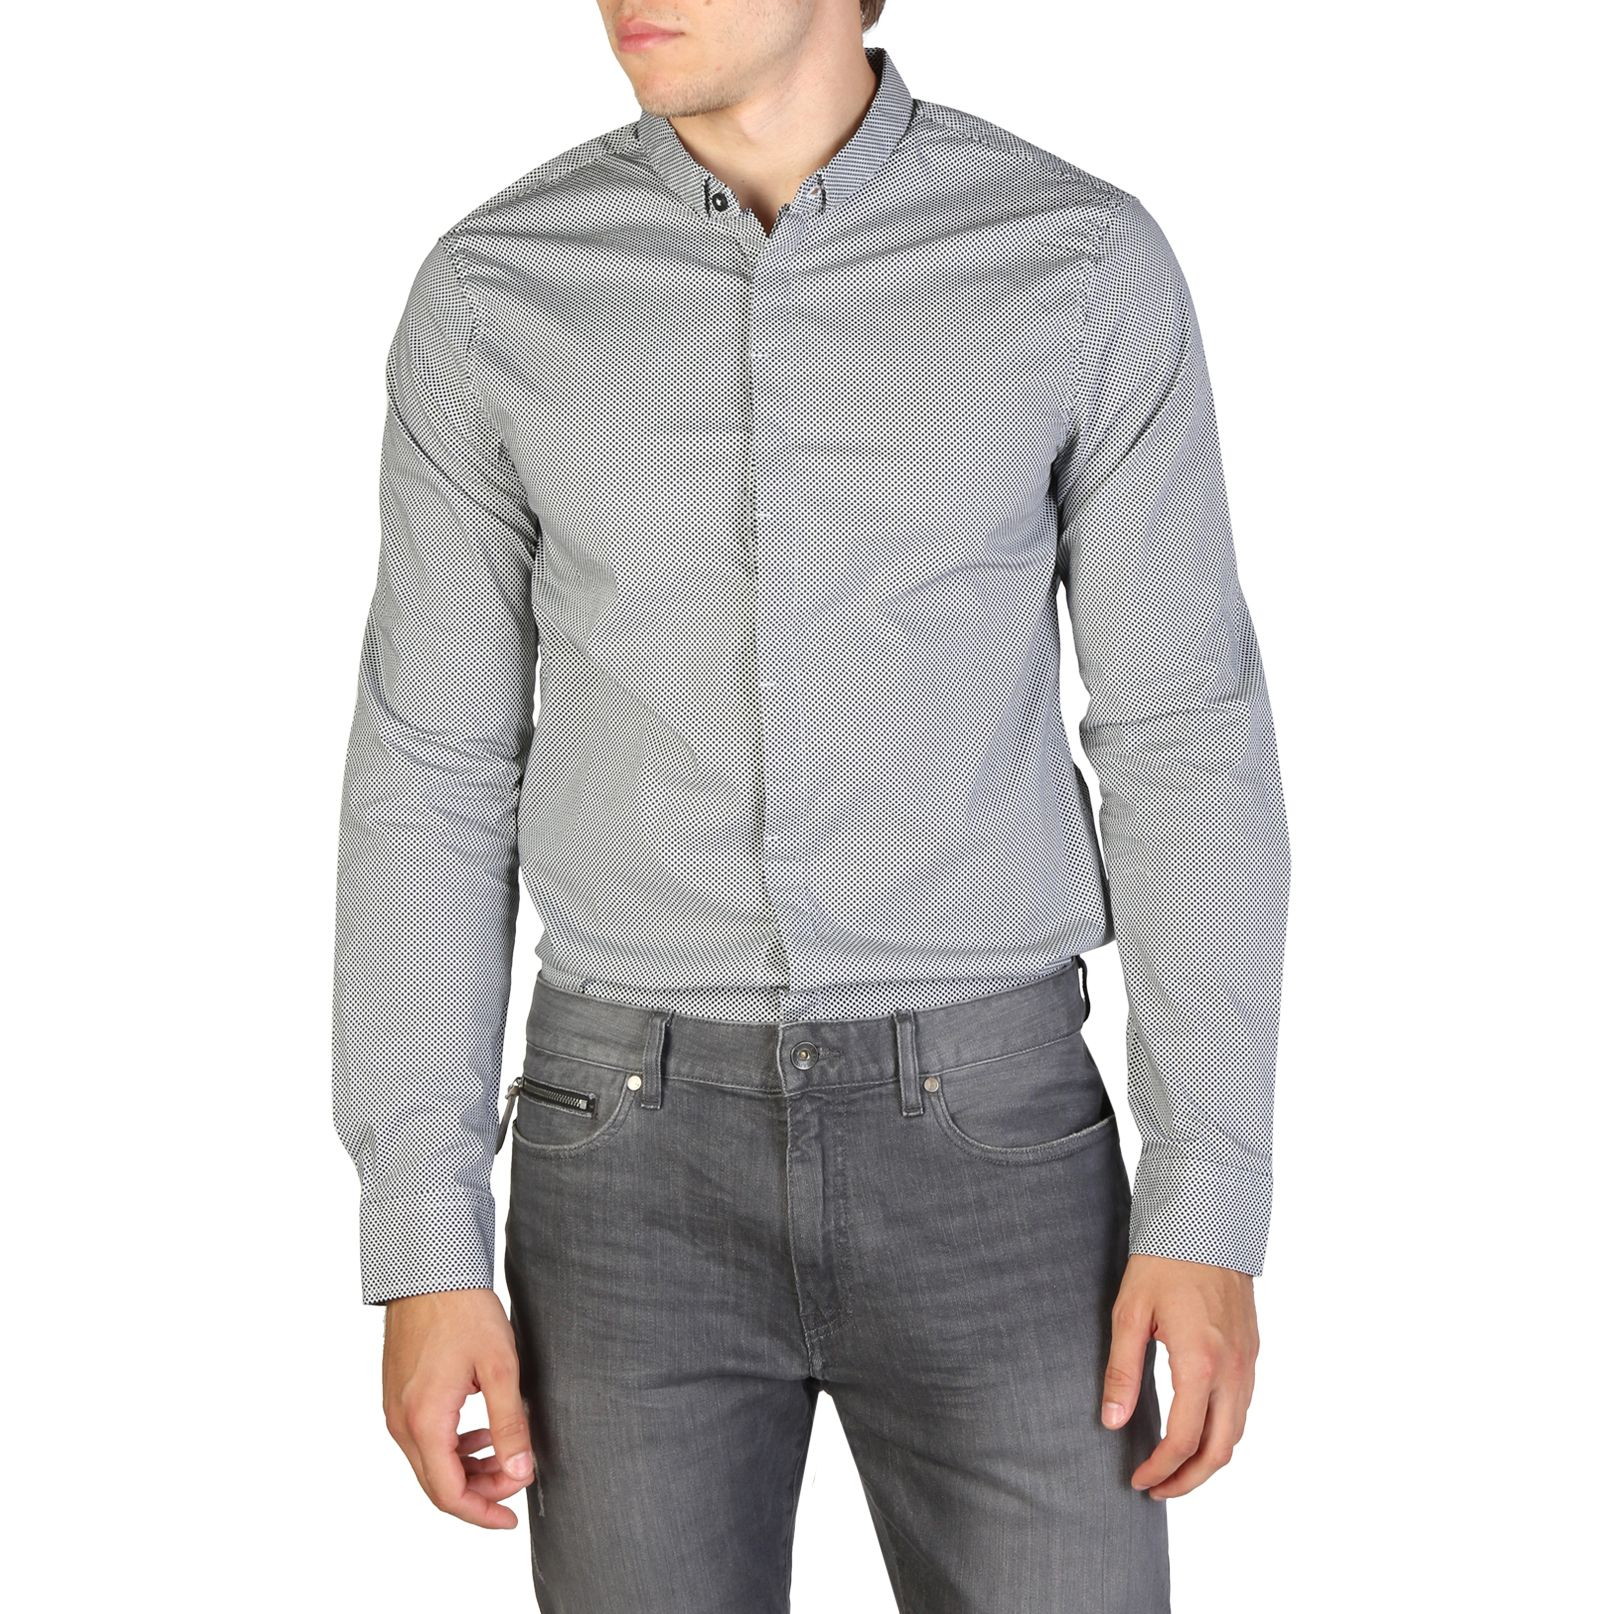 Armani Exchange Mens Shirts